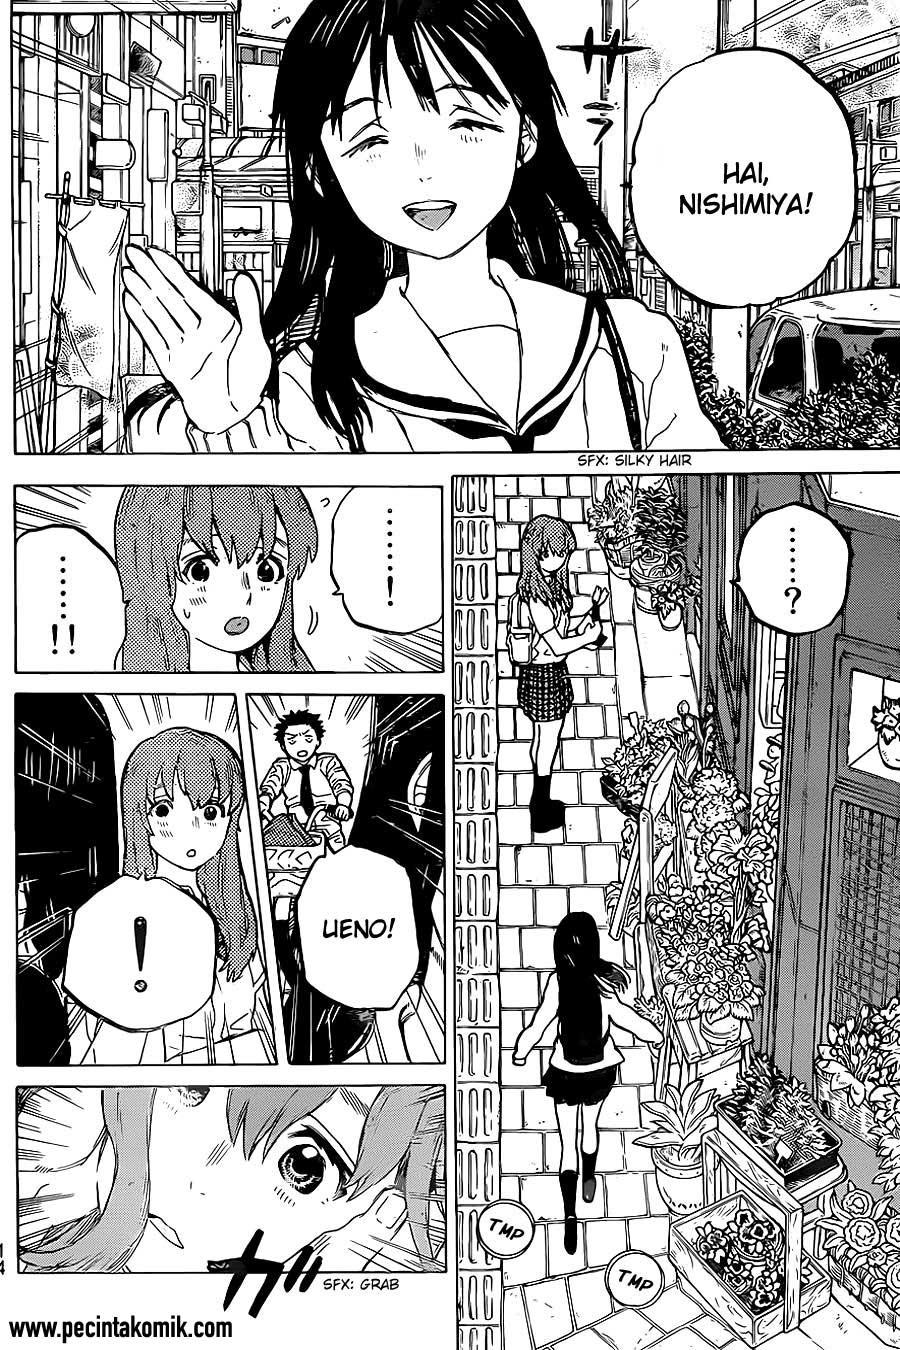 Koe no Katachi Chapter 21-6